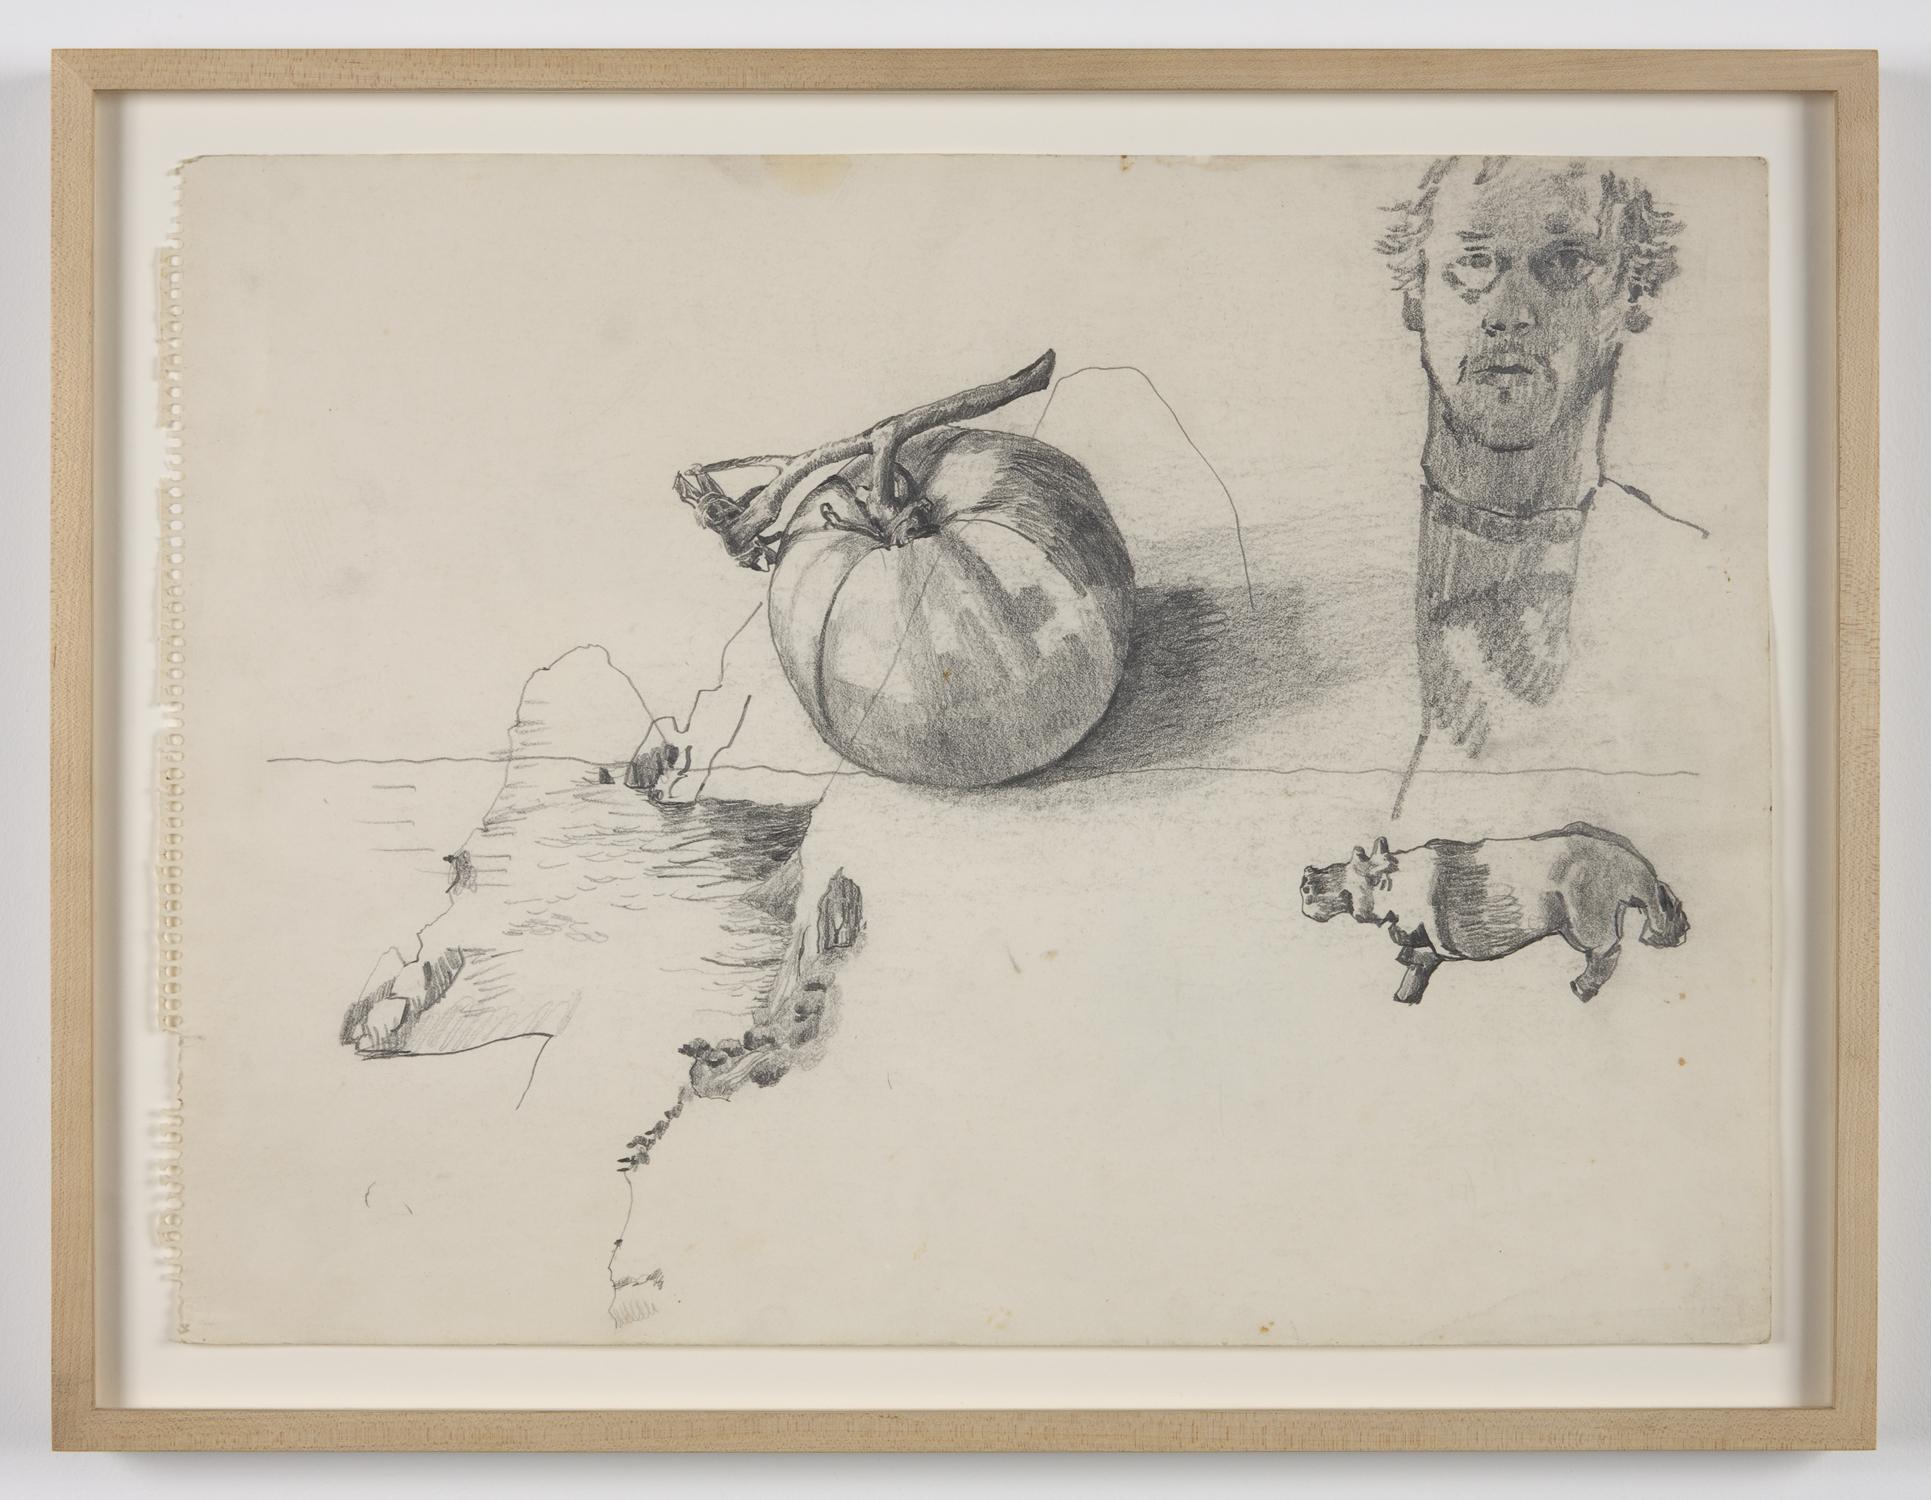 Untitled  (self-portrait, tomato, hippo) ca. 1970 pencil on paper 14 1/8 x 19 in/36 x 48.5 cm Photo: Joerg Lohse ©Estate of George Paul Thek, Courtesy Alexander and Bonin, New York